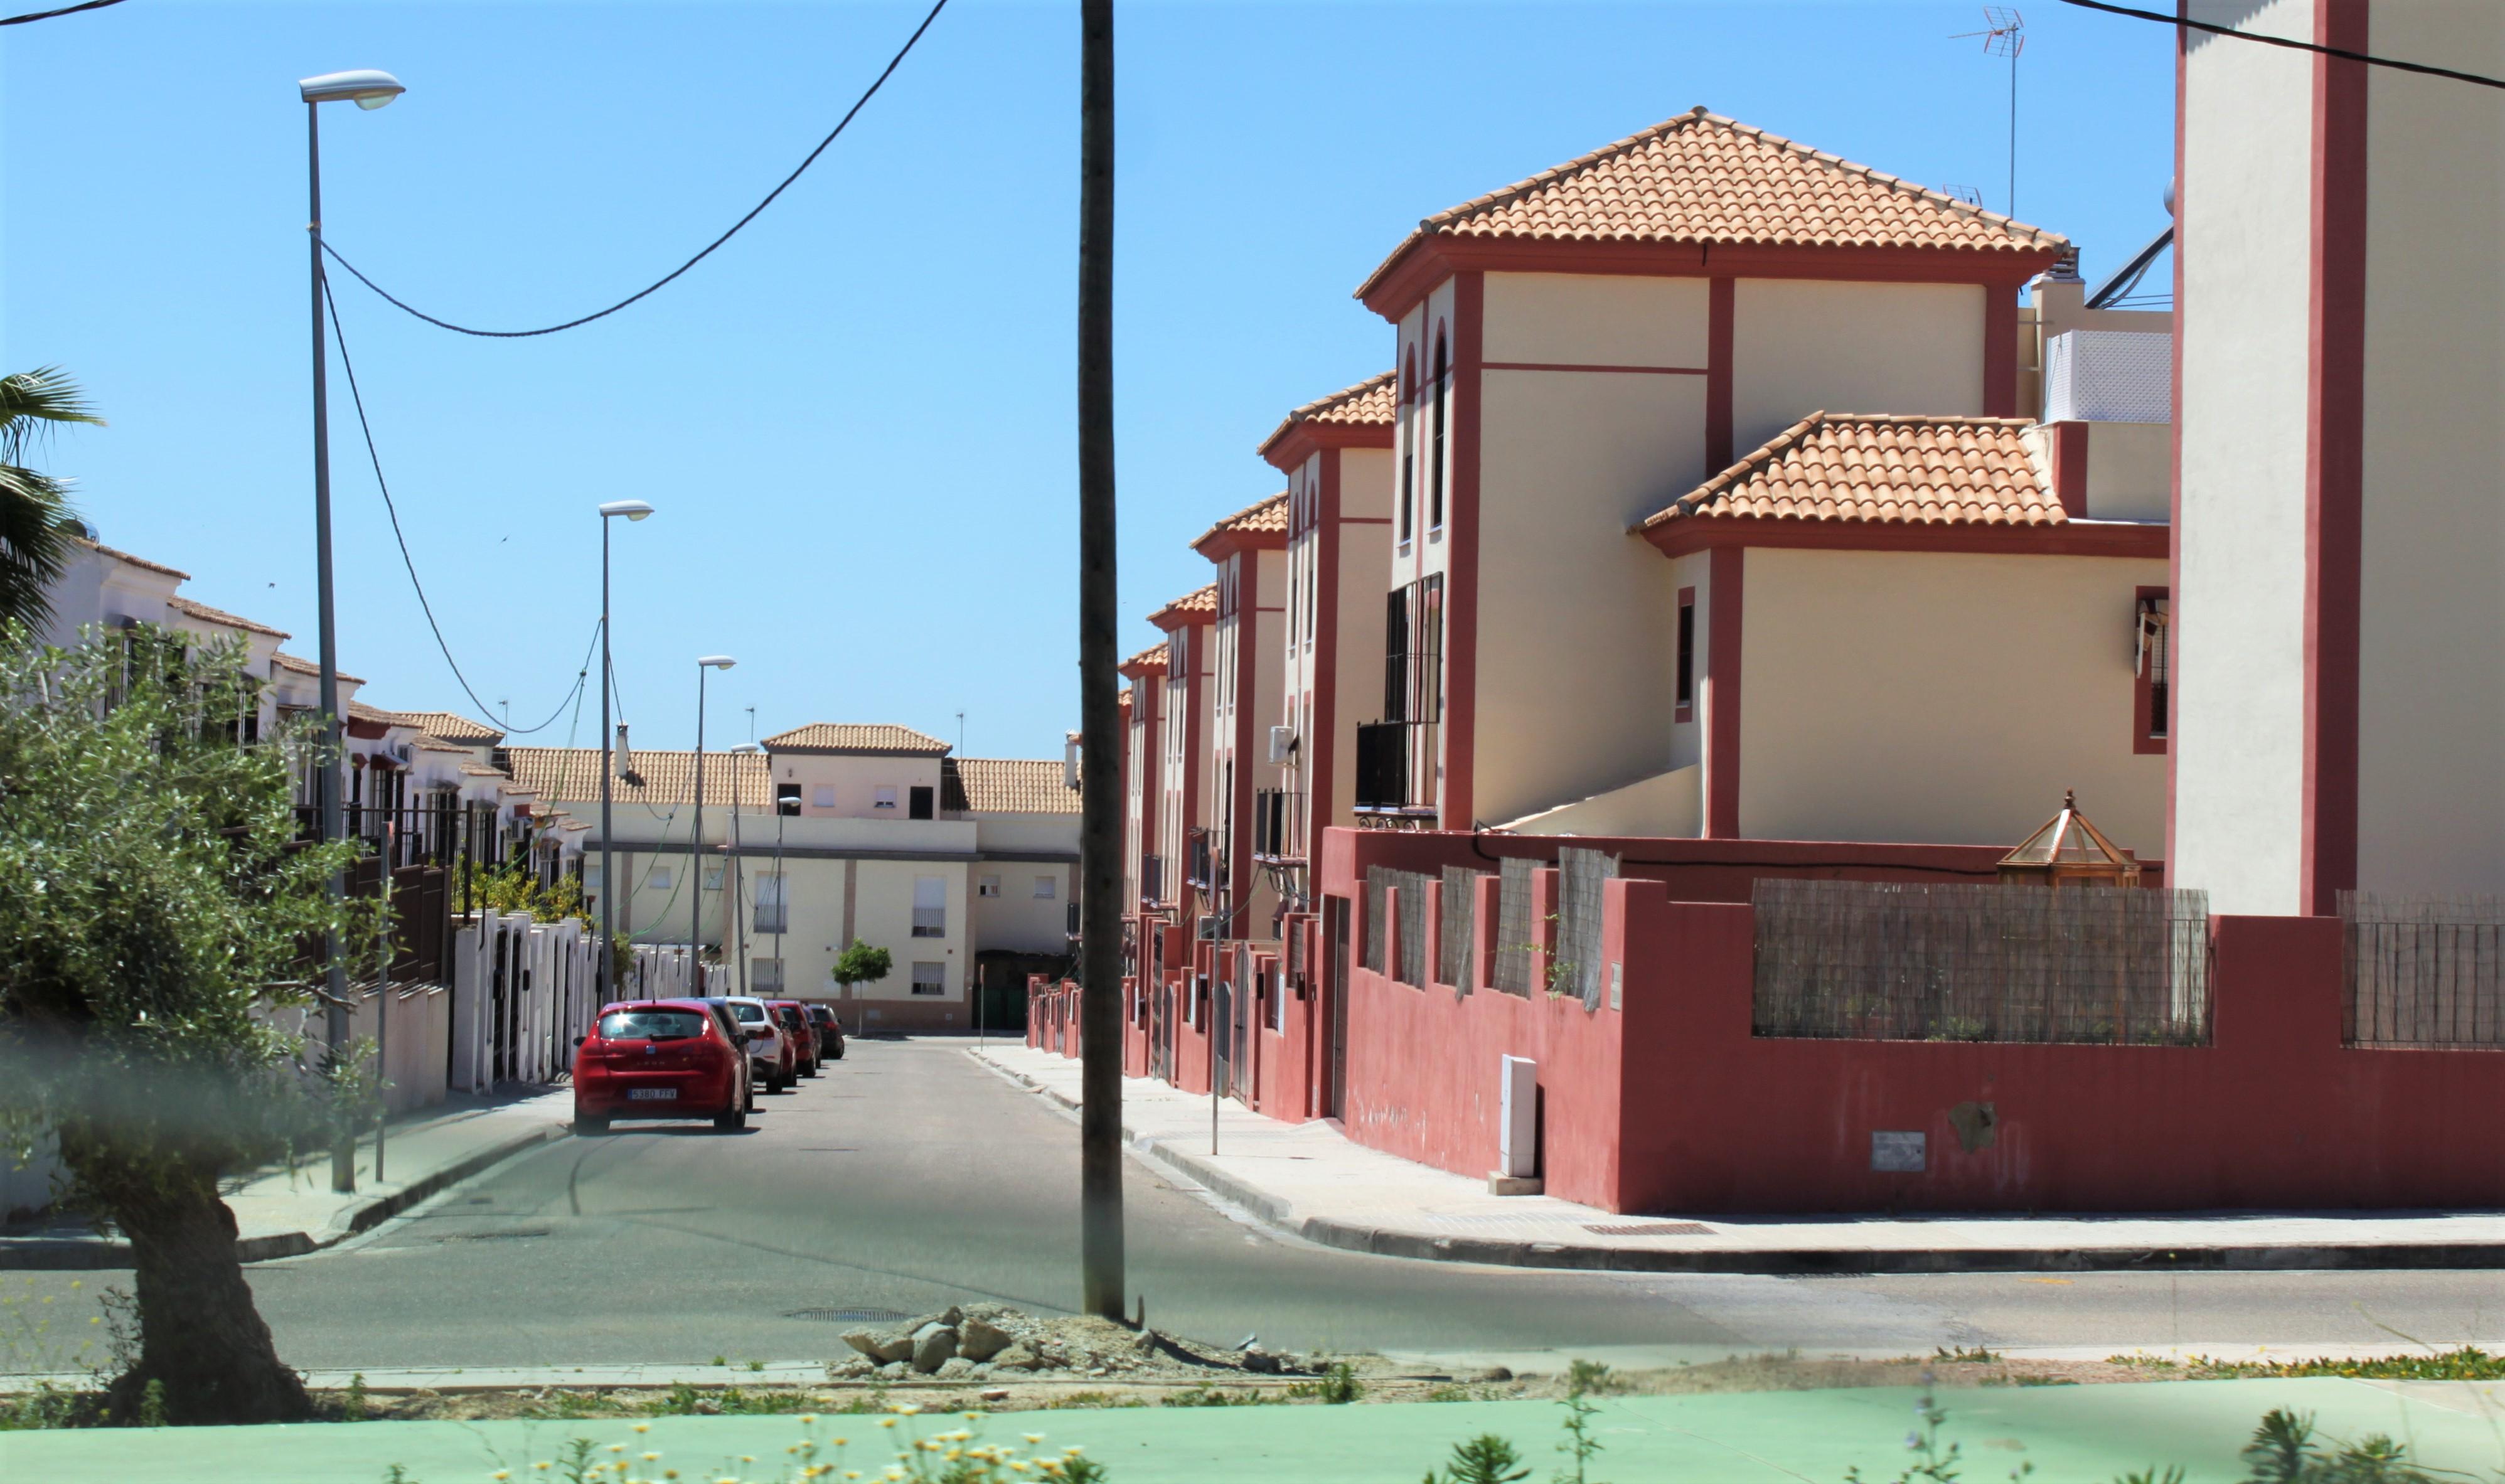 Ribera-Burguillos-Urbanizacionesfantasma